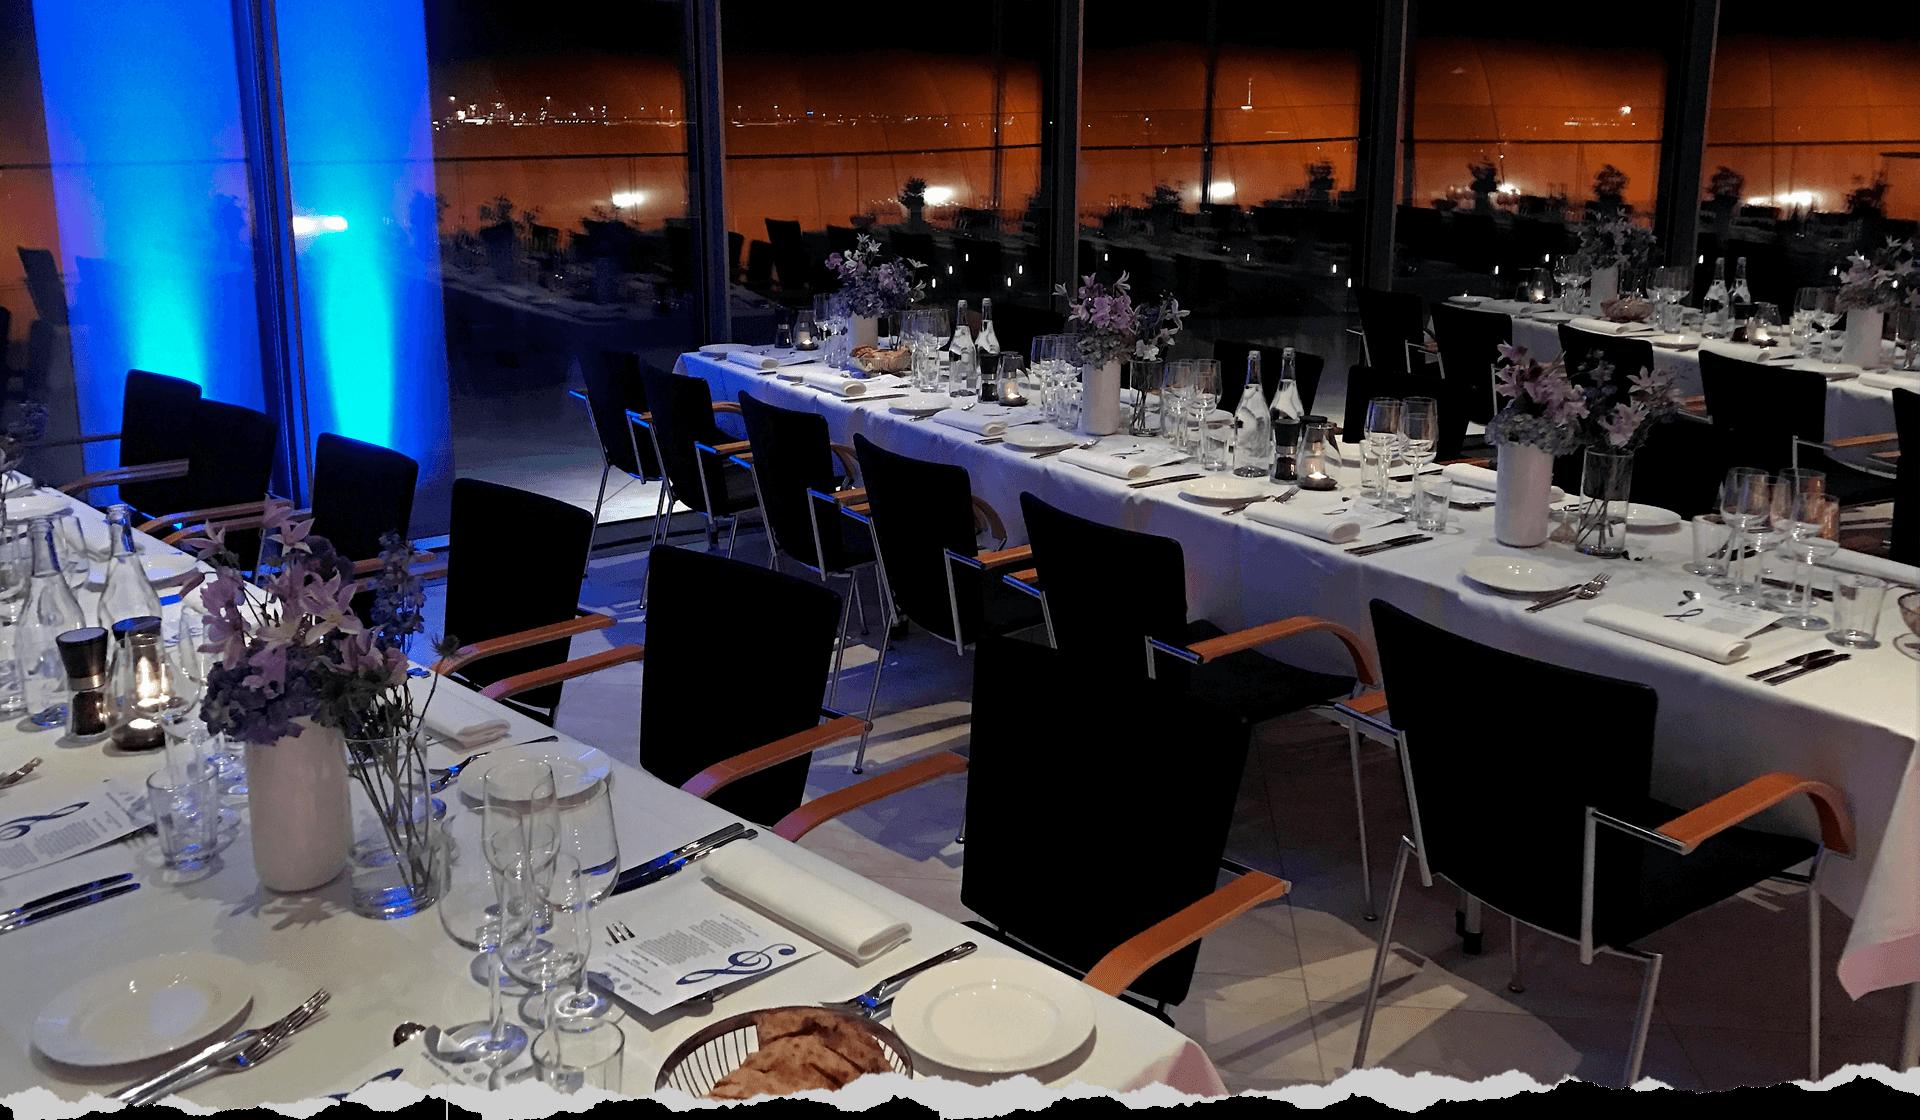 Header,-Stylish-Gala-Dinner-Event-at-iconic-Royal-Opera-House-in-Copenhagen,-Credits-DMC-Nordic